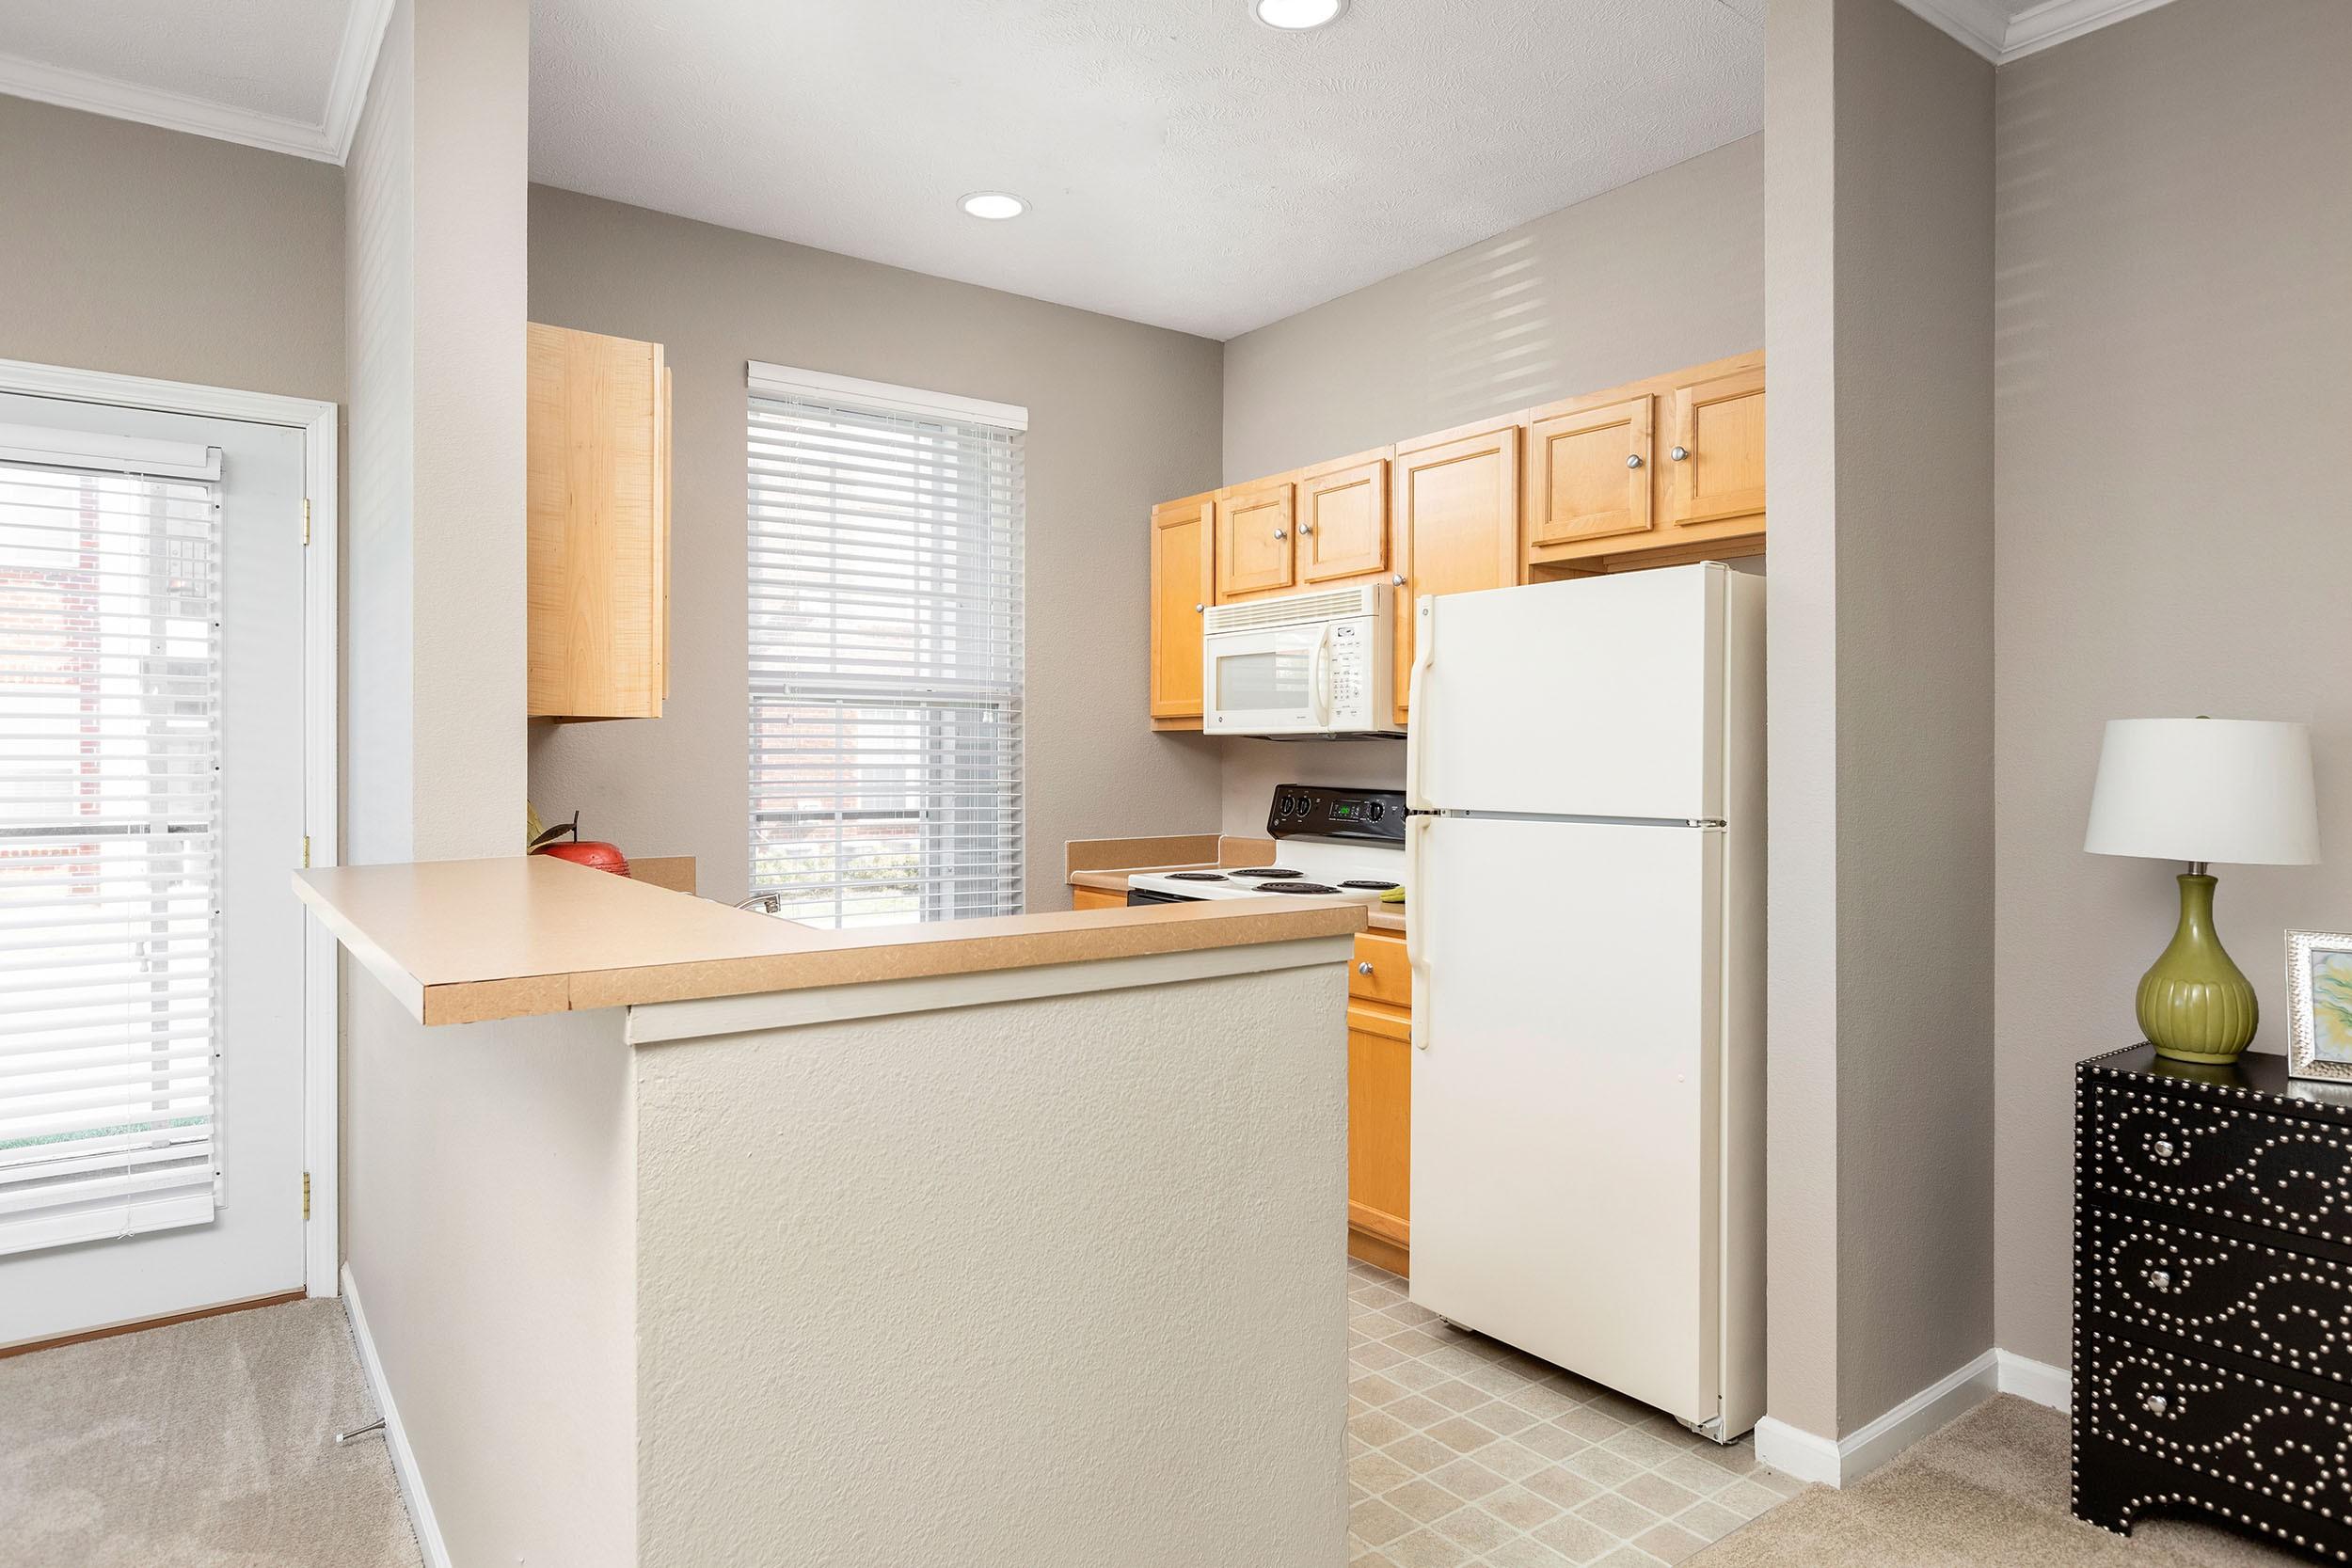 Bayview Club Apartment Homes rental